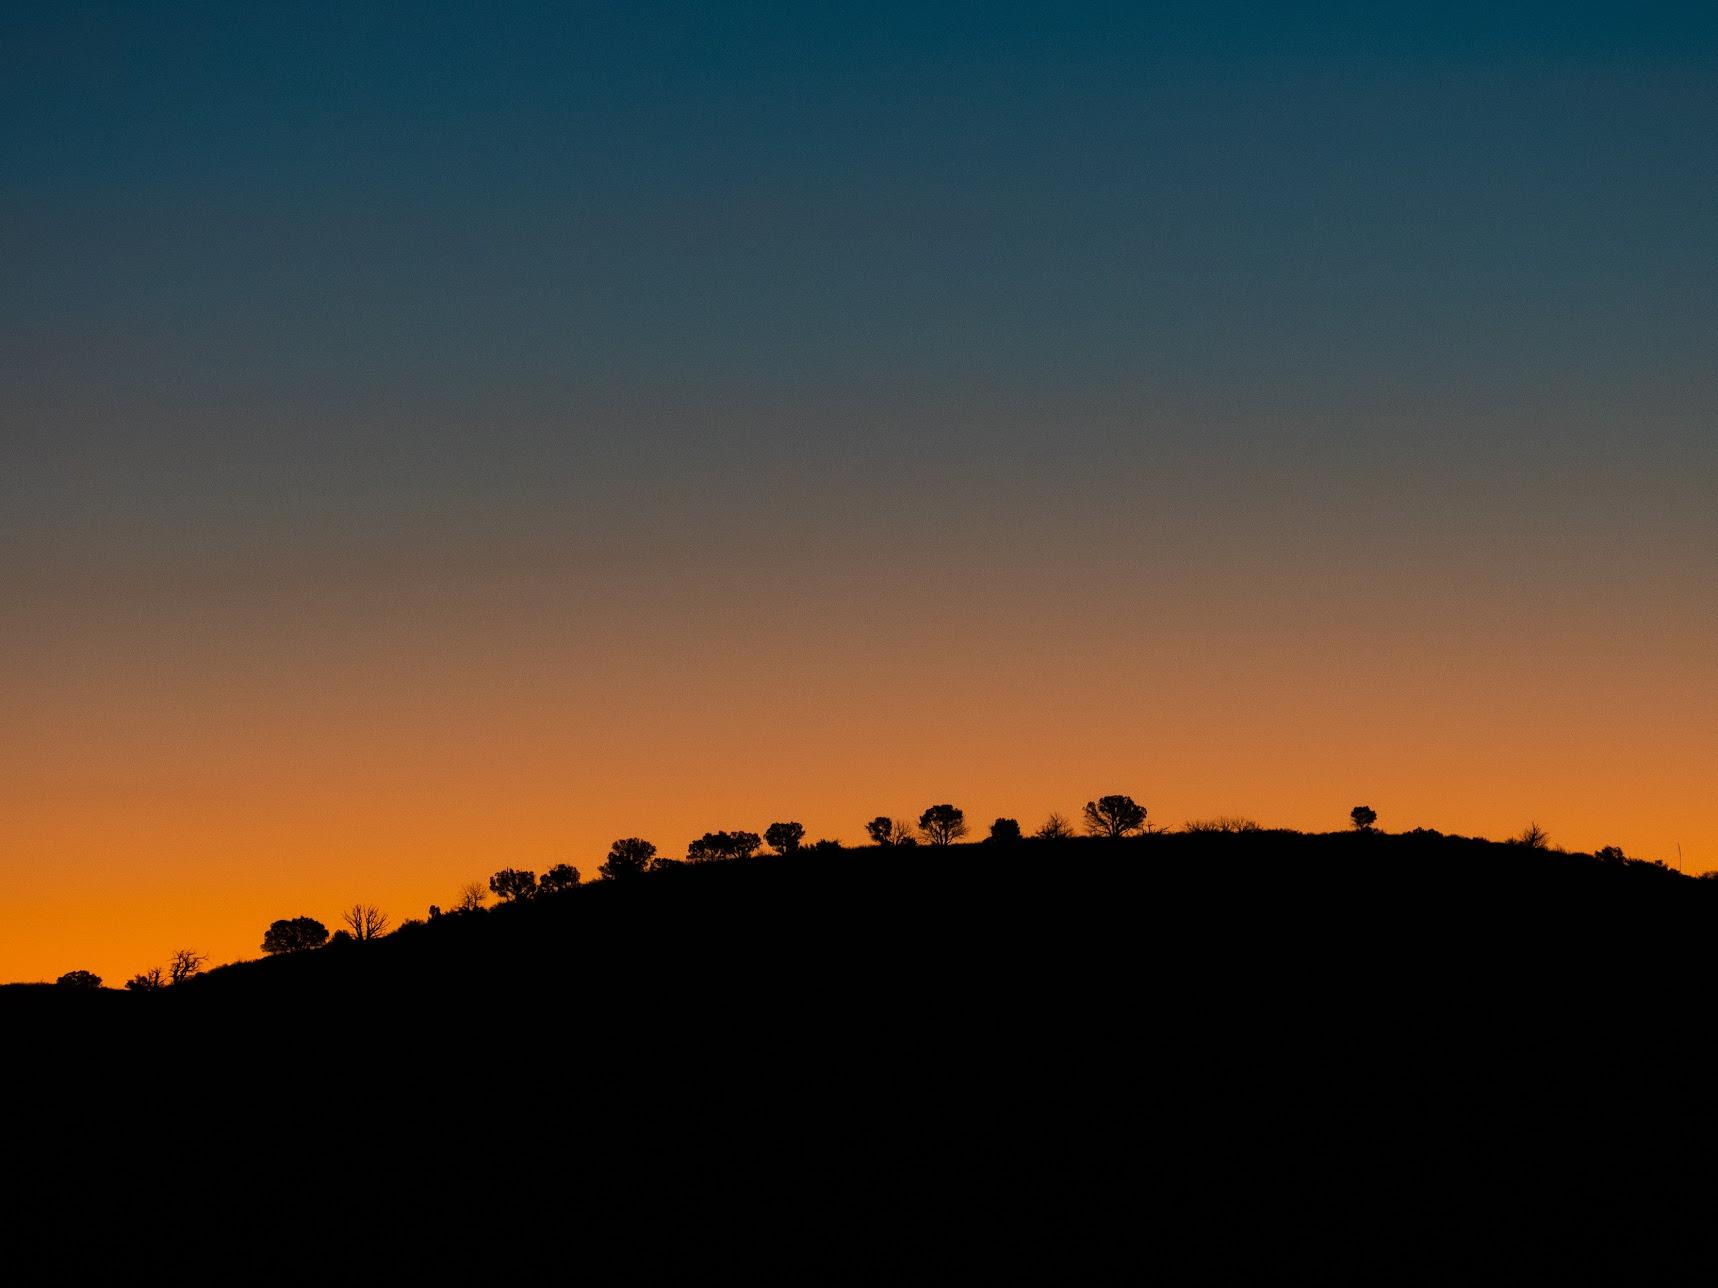 Sunrise over trees